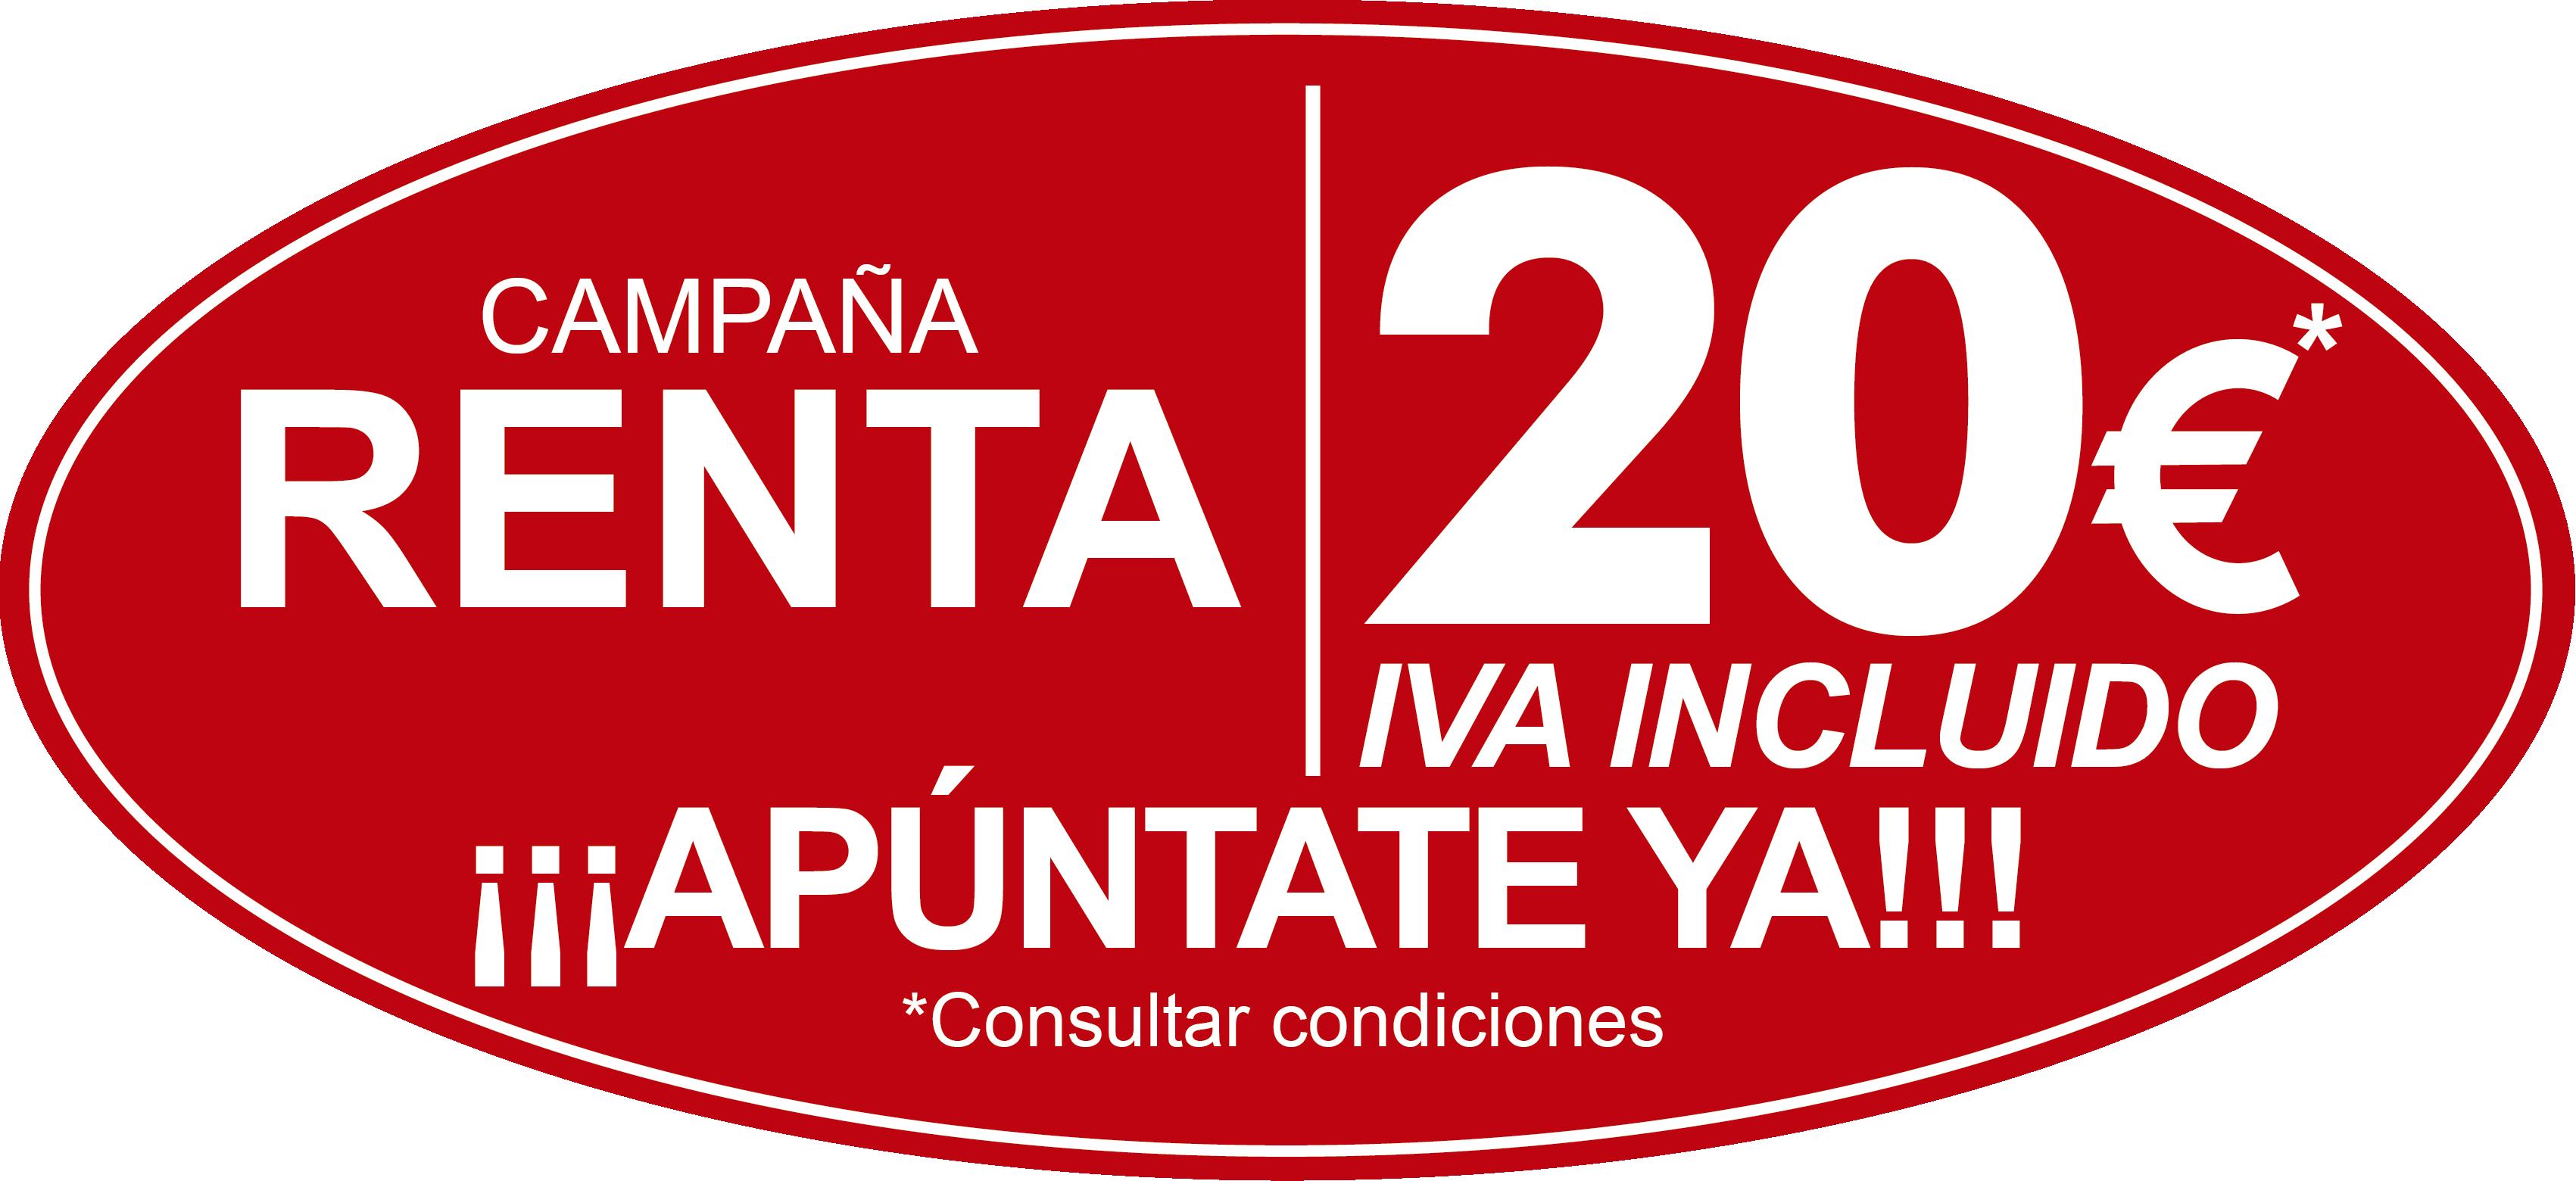 declaracion-renta-20-euros